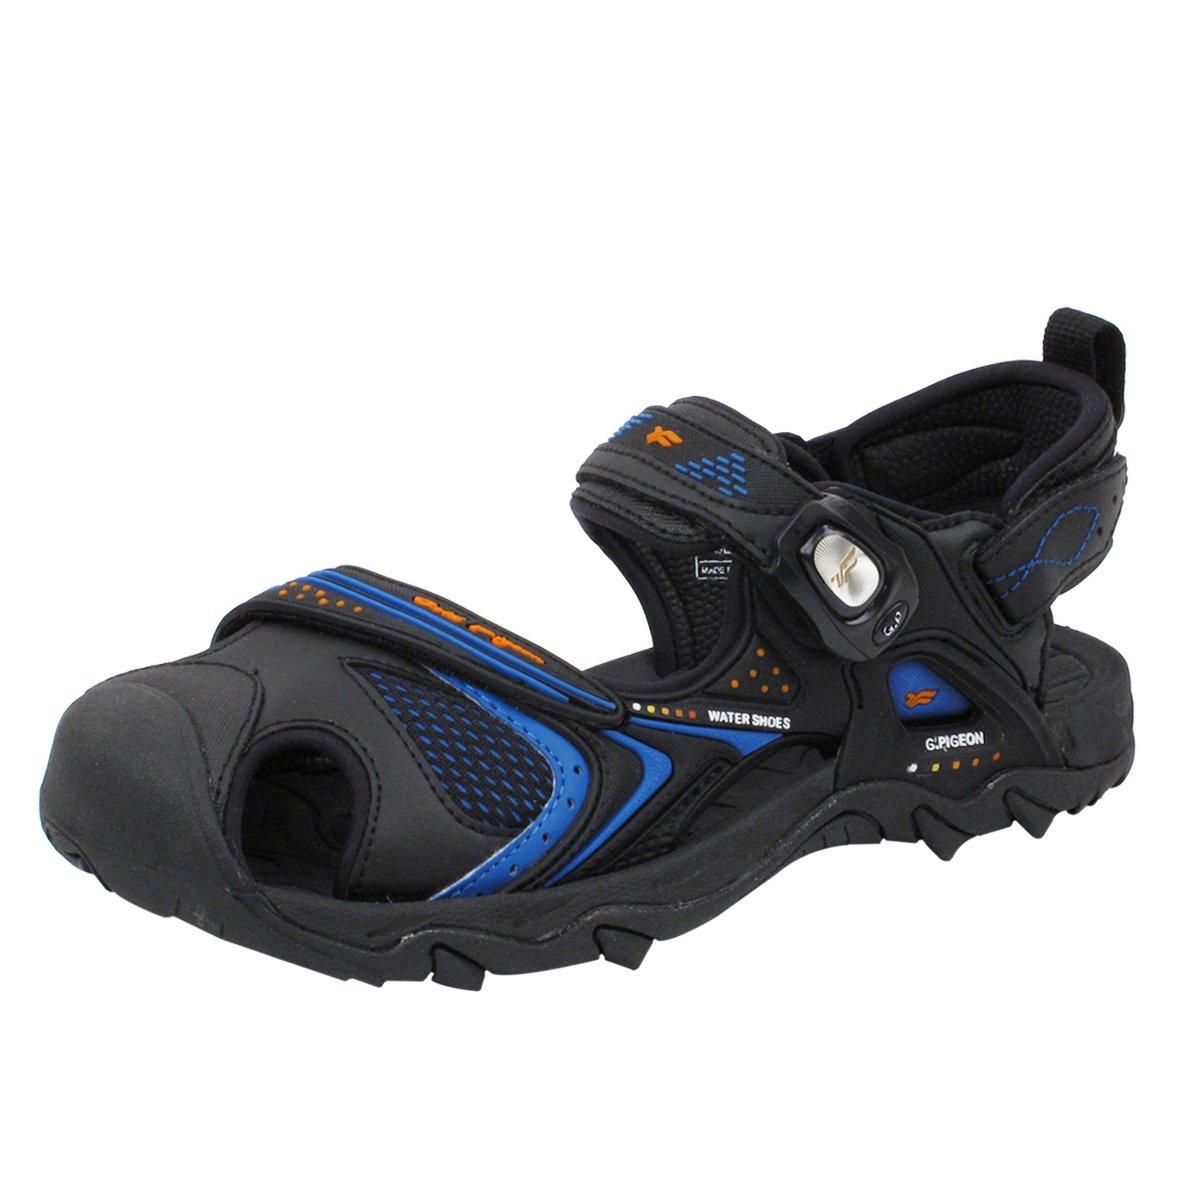 Gold Pigeon Shoes GP5937 Easy Snap Lock Closure Sports/Water Sandals for Men & Women B01BRT03R2 EU36: Women 6/6.5 & Kids 5/5.5|5937 Black Blue